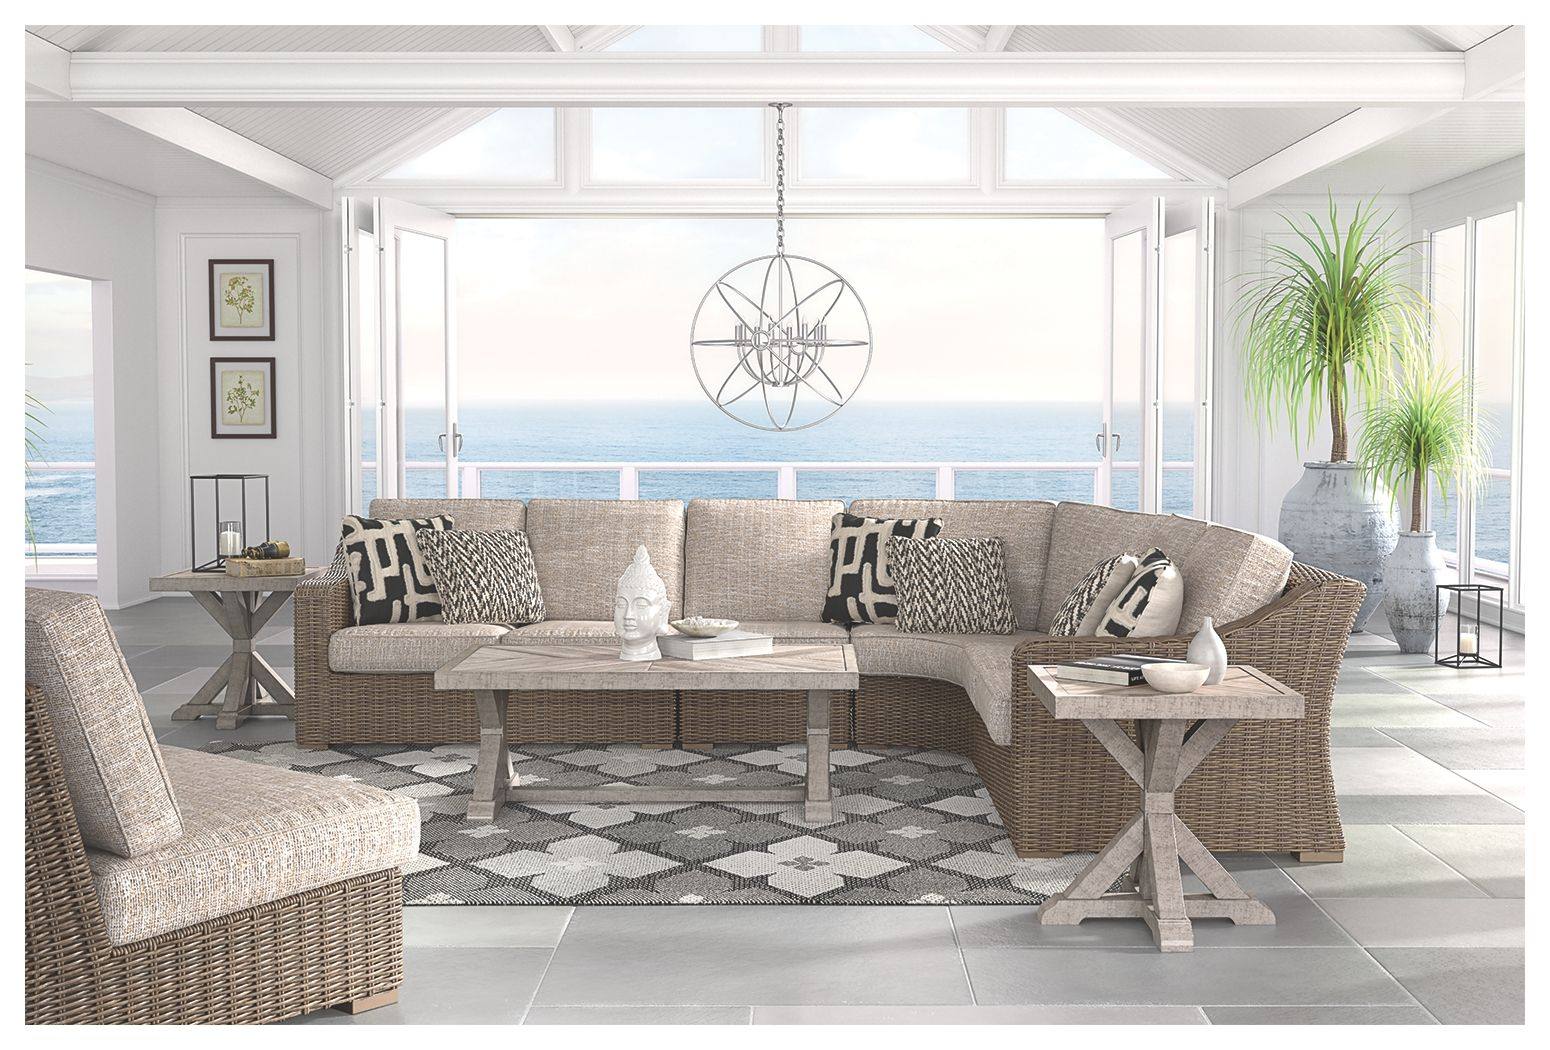 Beachcroft Armless Chair with Cushion, Beige   Outdoor ... on Beachcroft Beige Outdoor Living Room Set id=67456